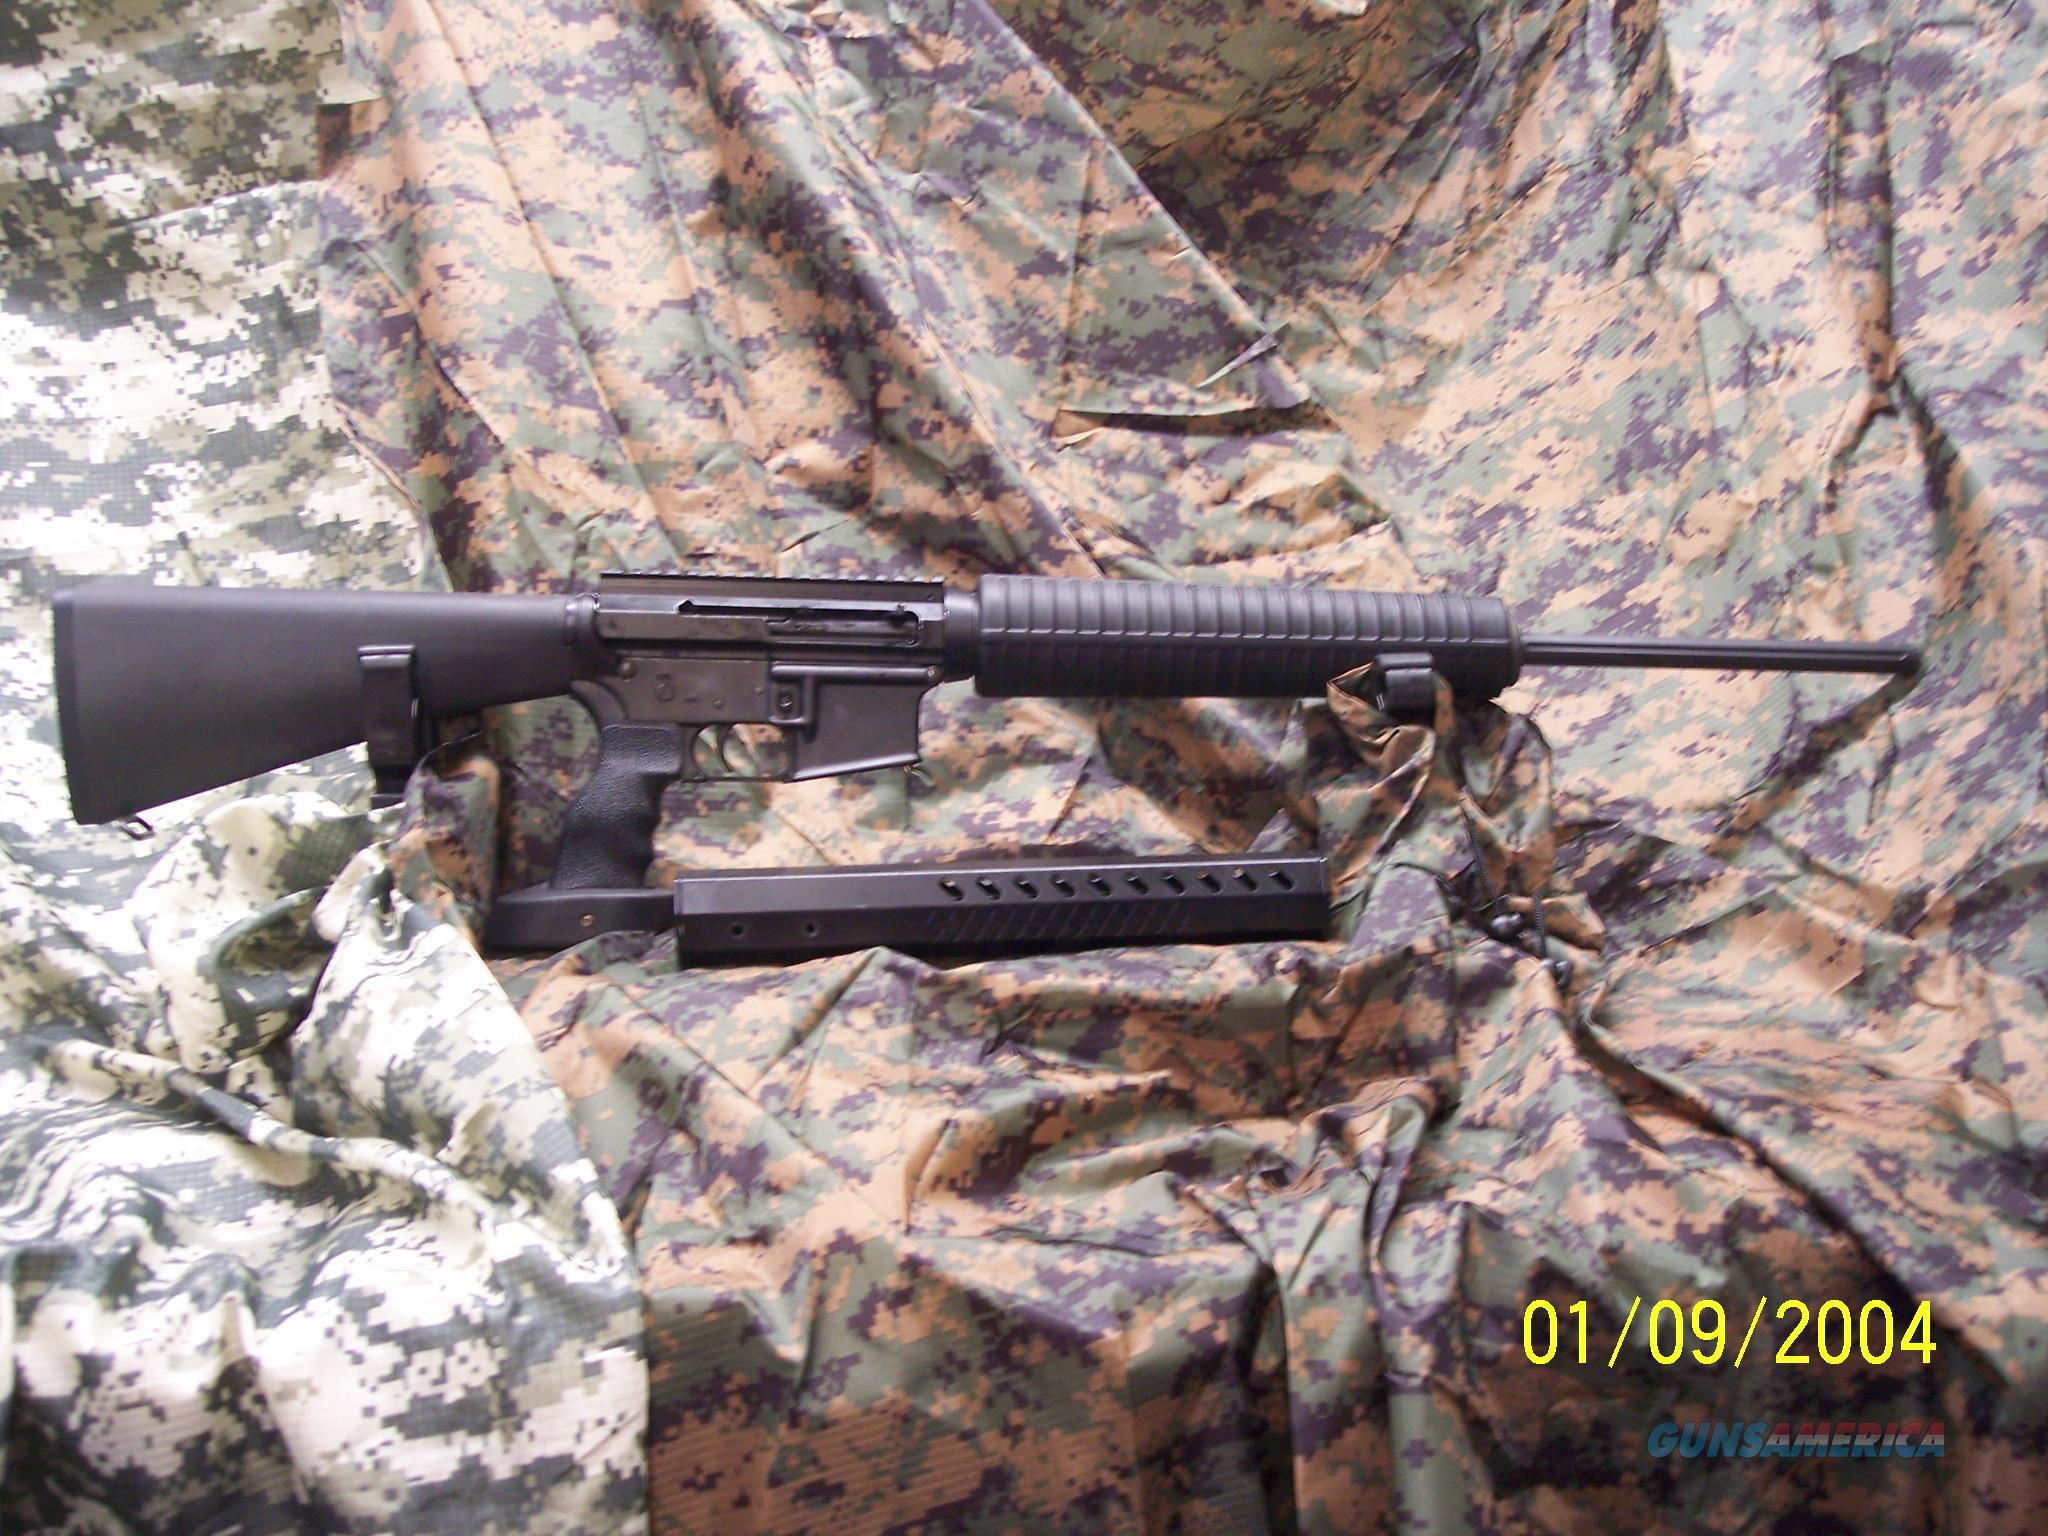 JARD Upper Receiver  Guns > Rifles > AR-15 Rifles - Small Manufacturers > Complete Rifle